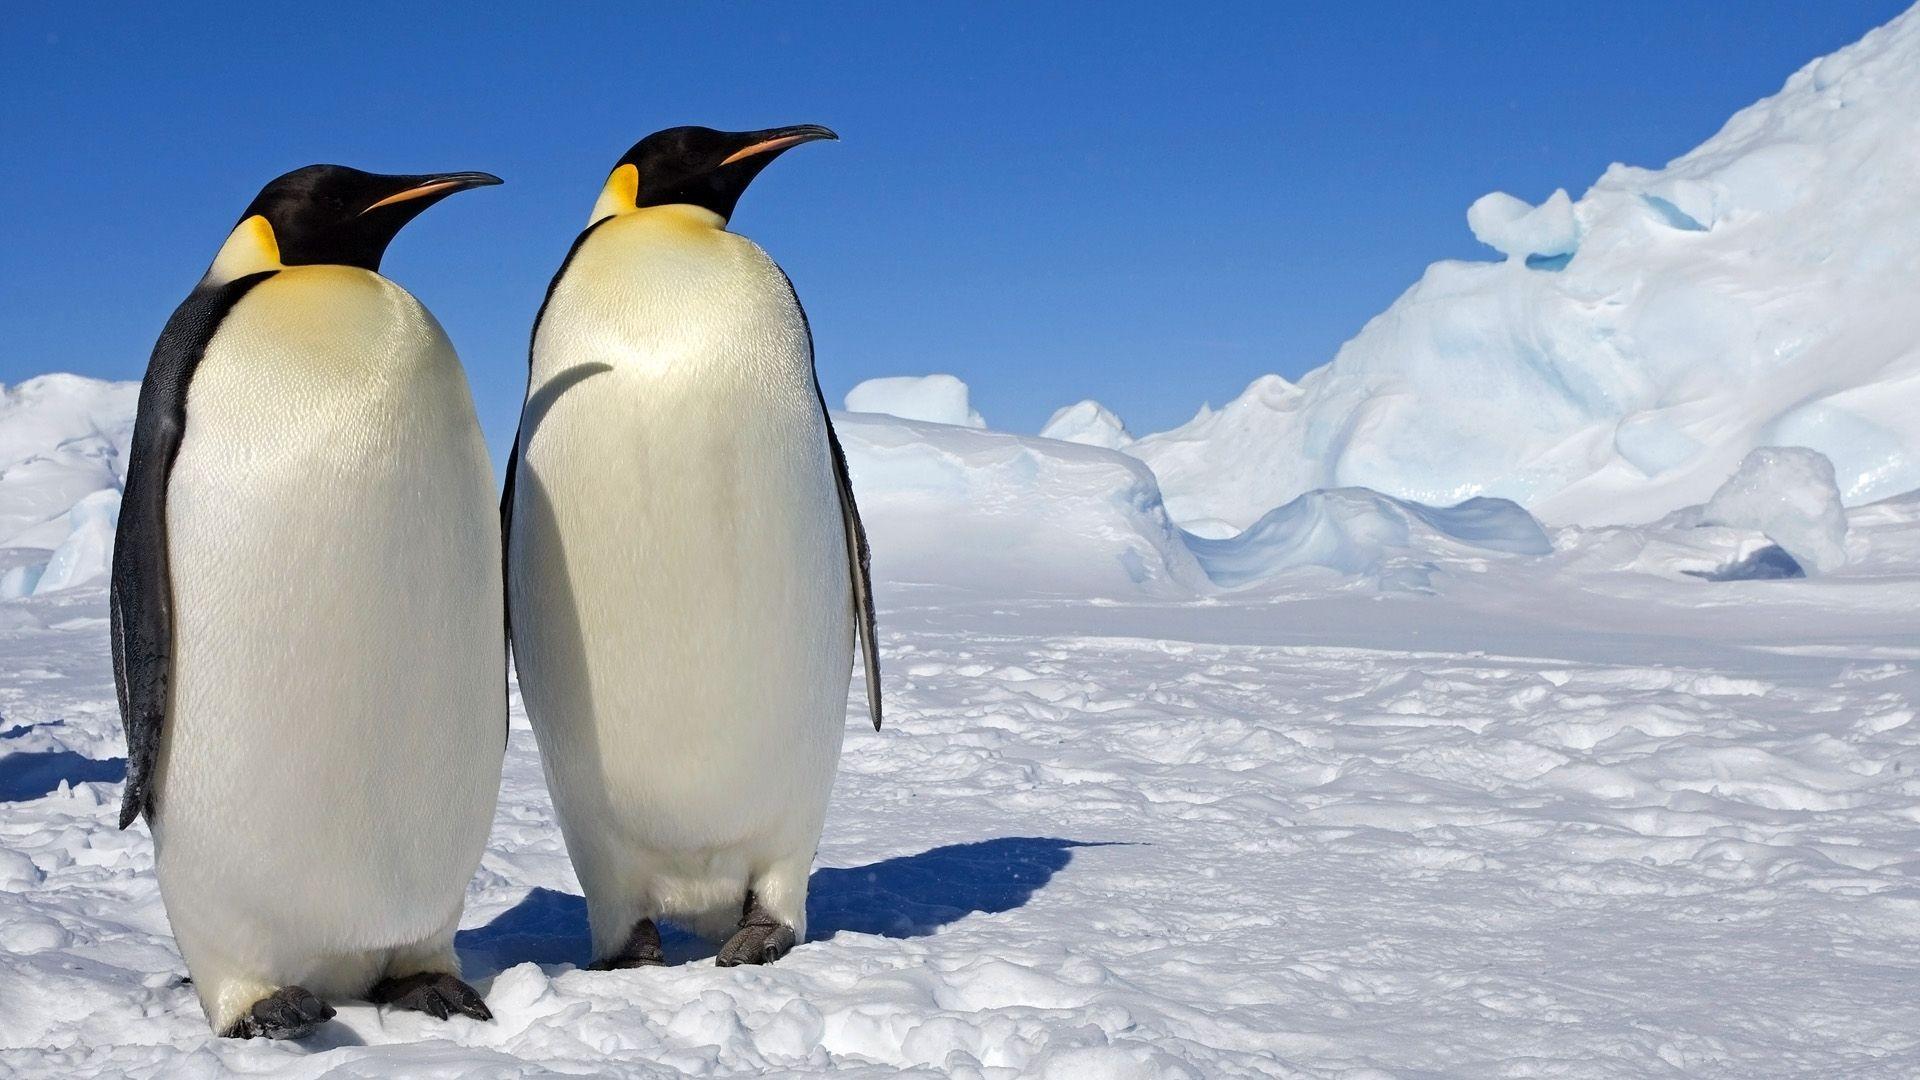 2048x1366 Penguin Wallpaper HD Pictures